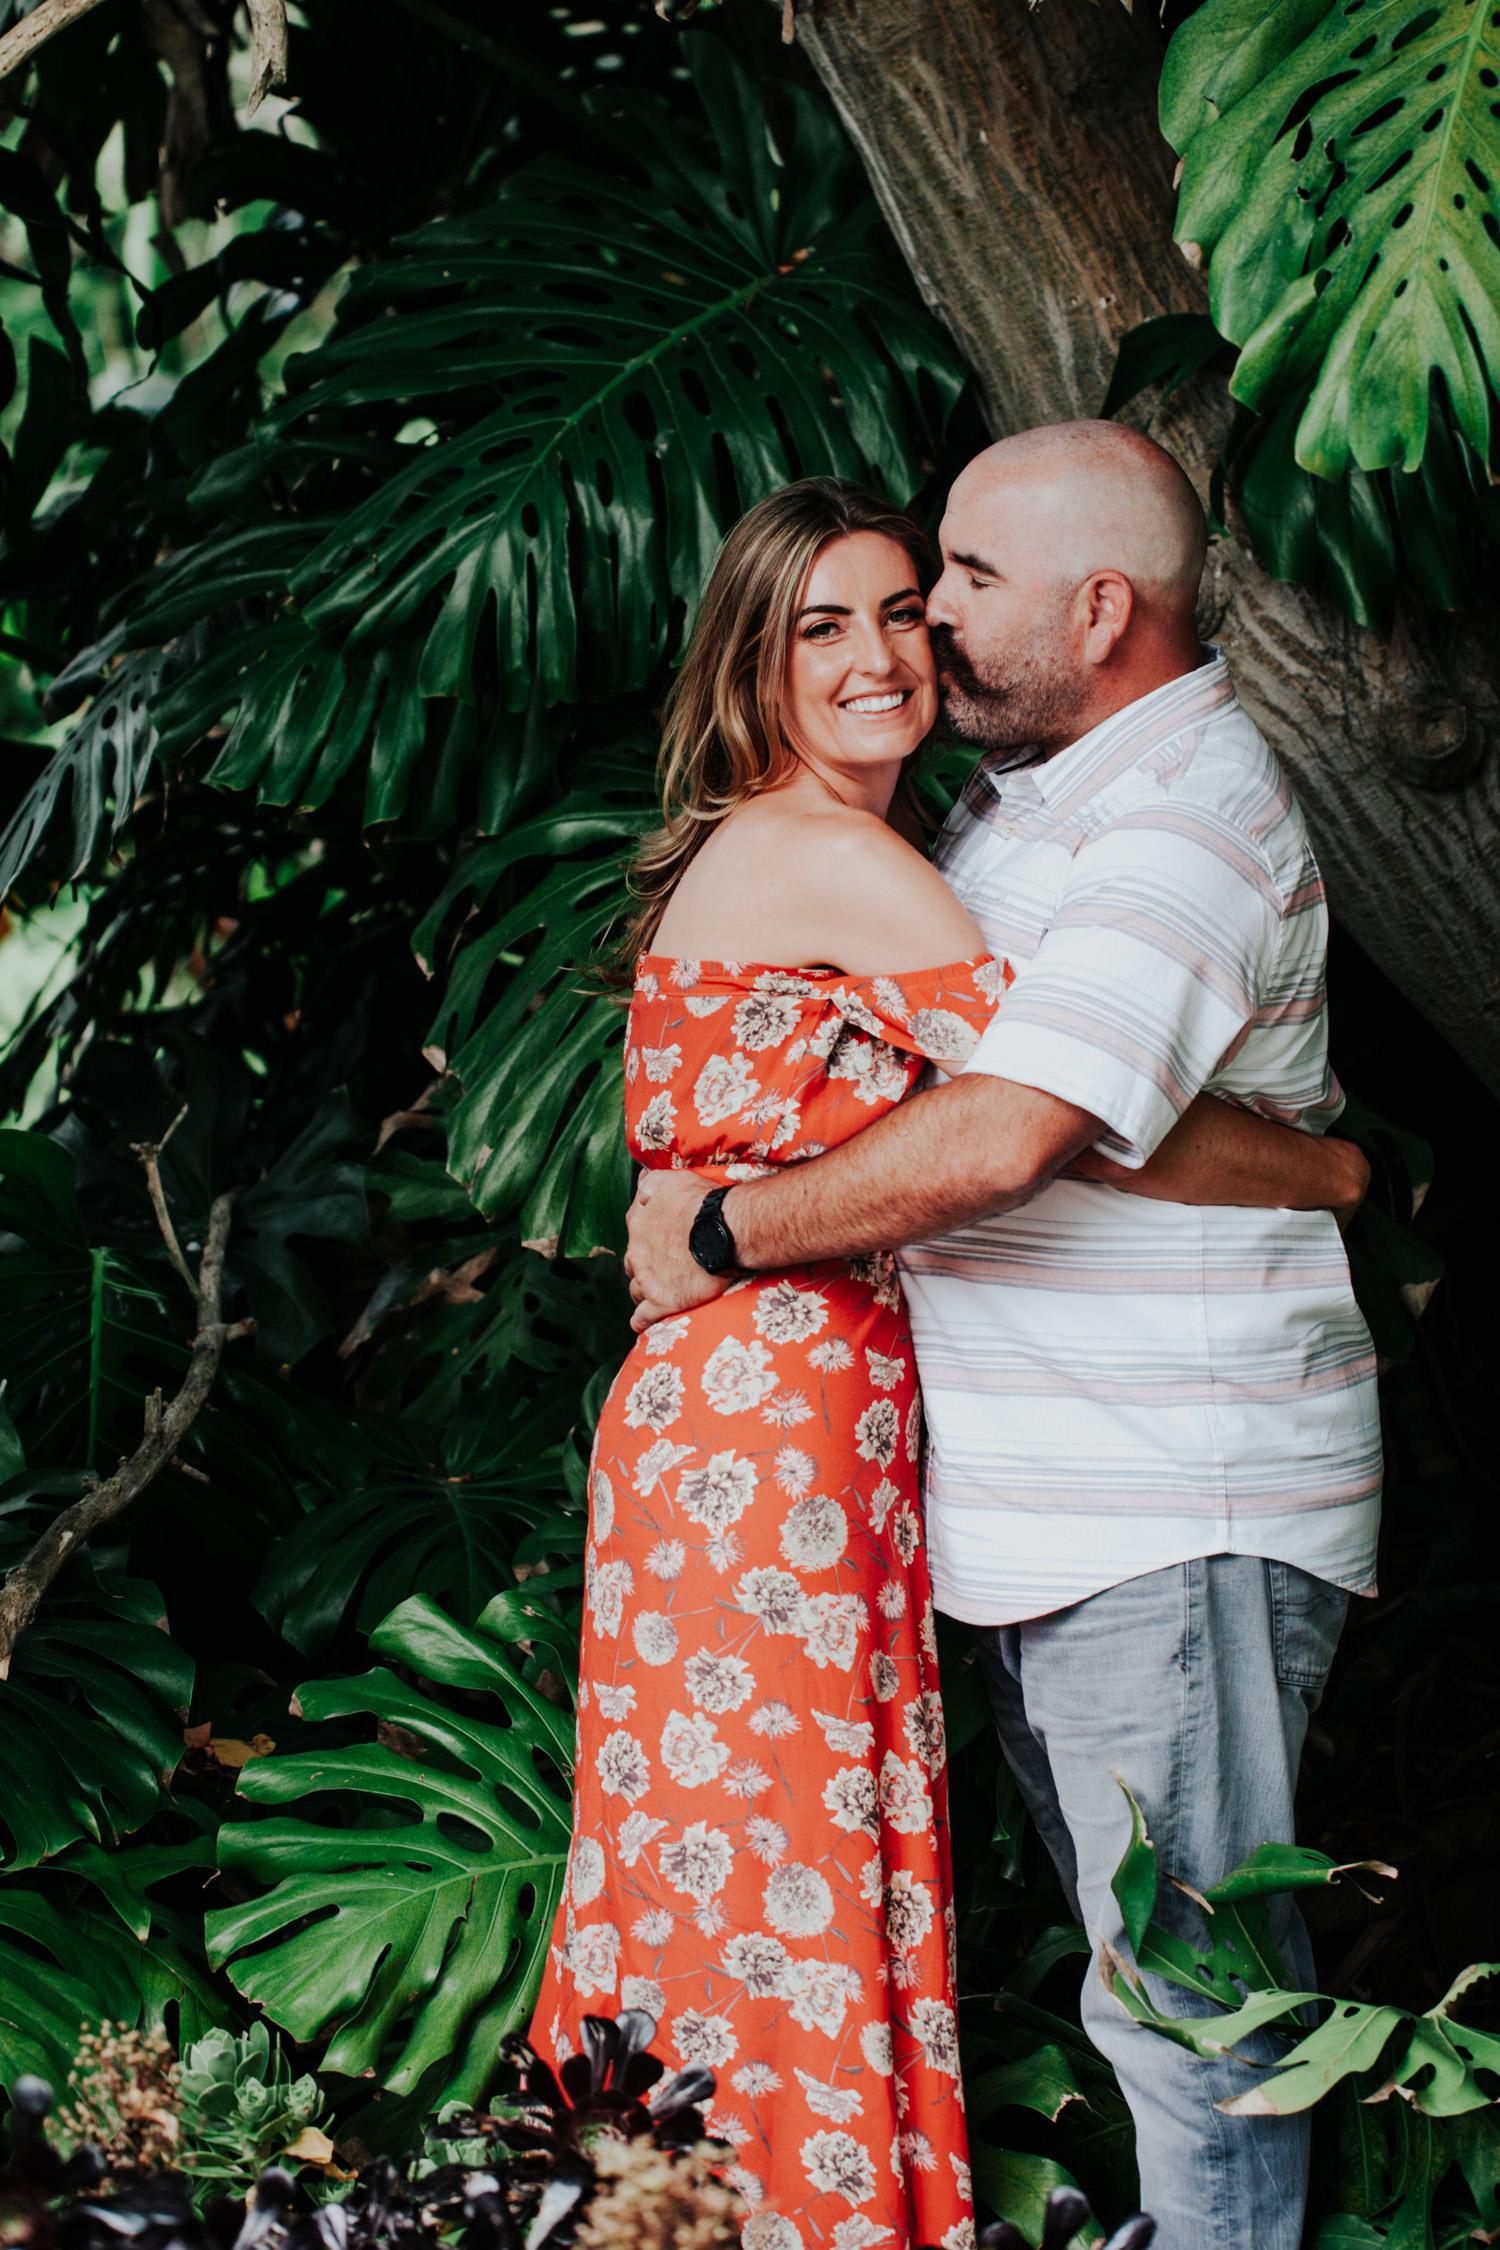 terranea-resort-palos-verdes-california-wedding-photography-cove-los-angeles-pierce-28.jpg